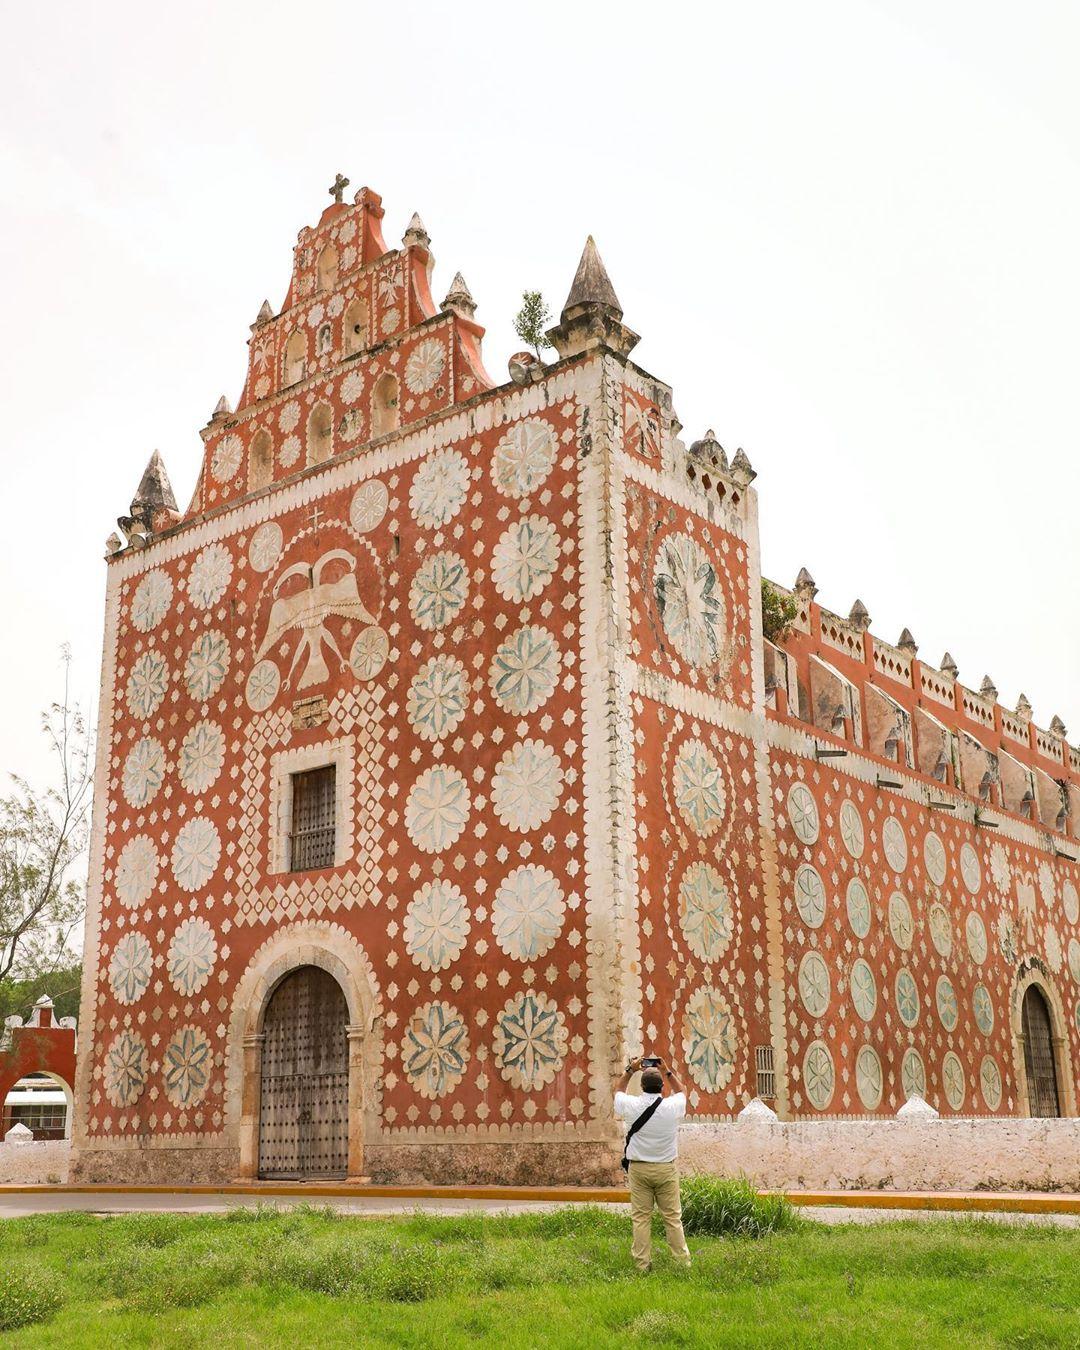 Iglesia de Uayma Yucatan, las iglesias mas hermosas de yucatan, top yucatan churches